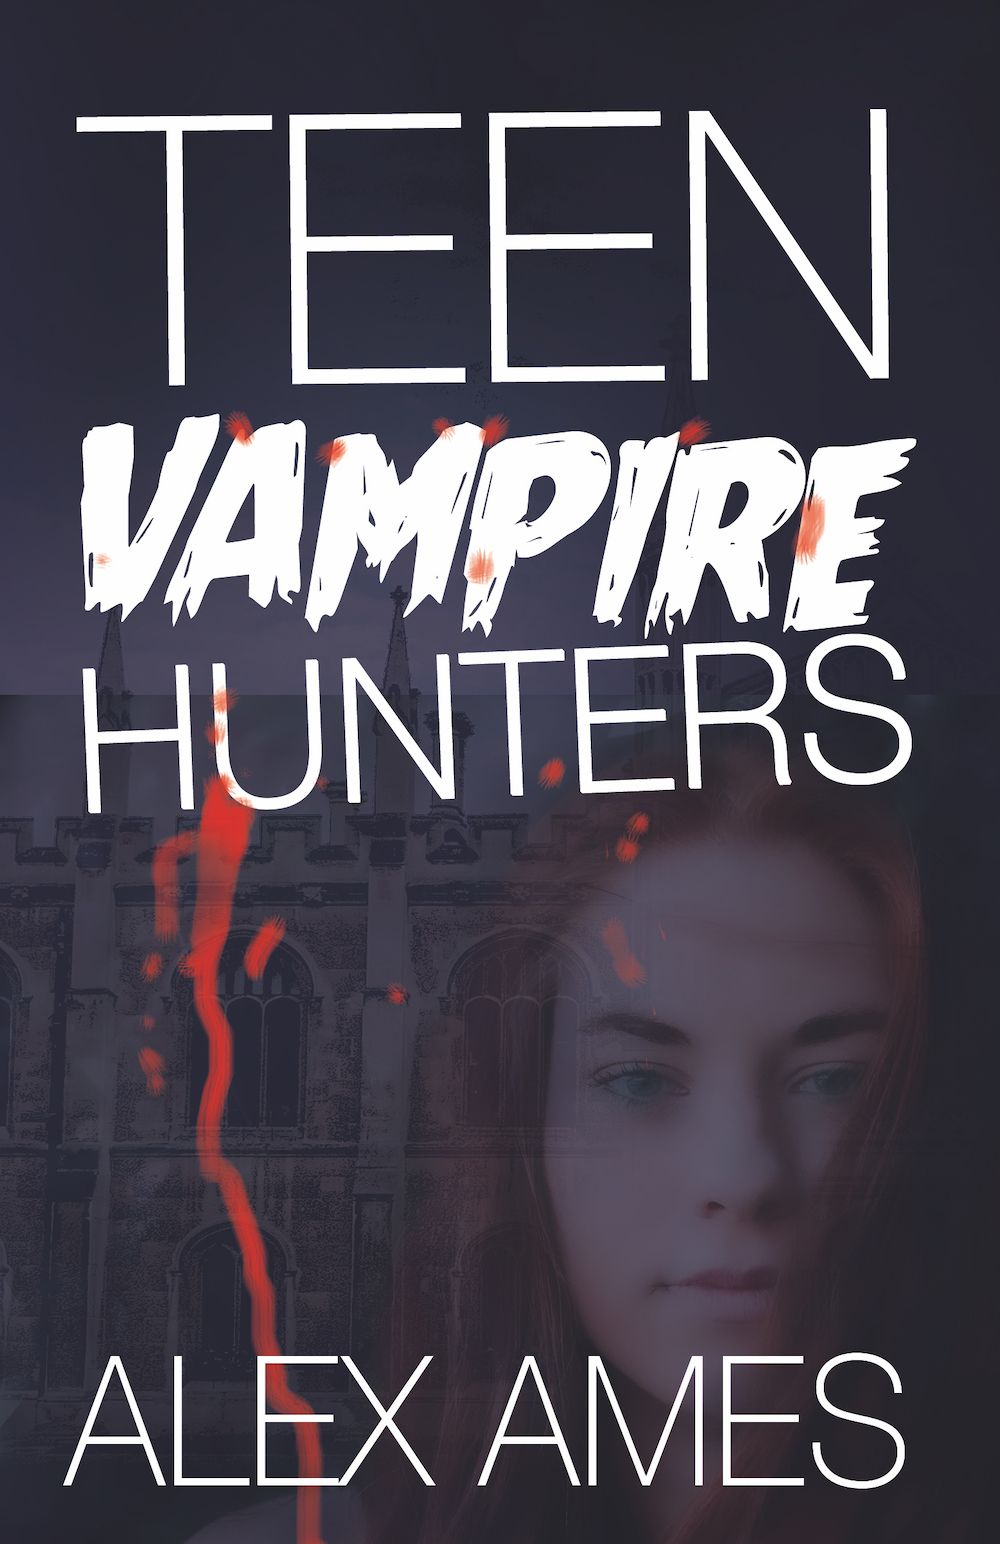 Teen Vampire Hunters Alex Ames eBook Cover